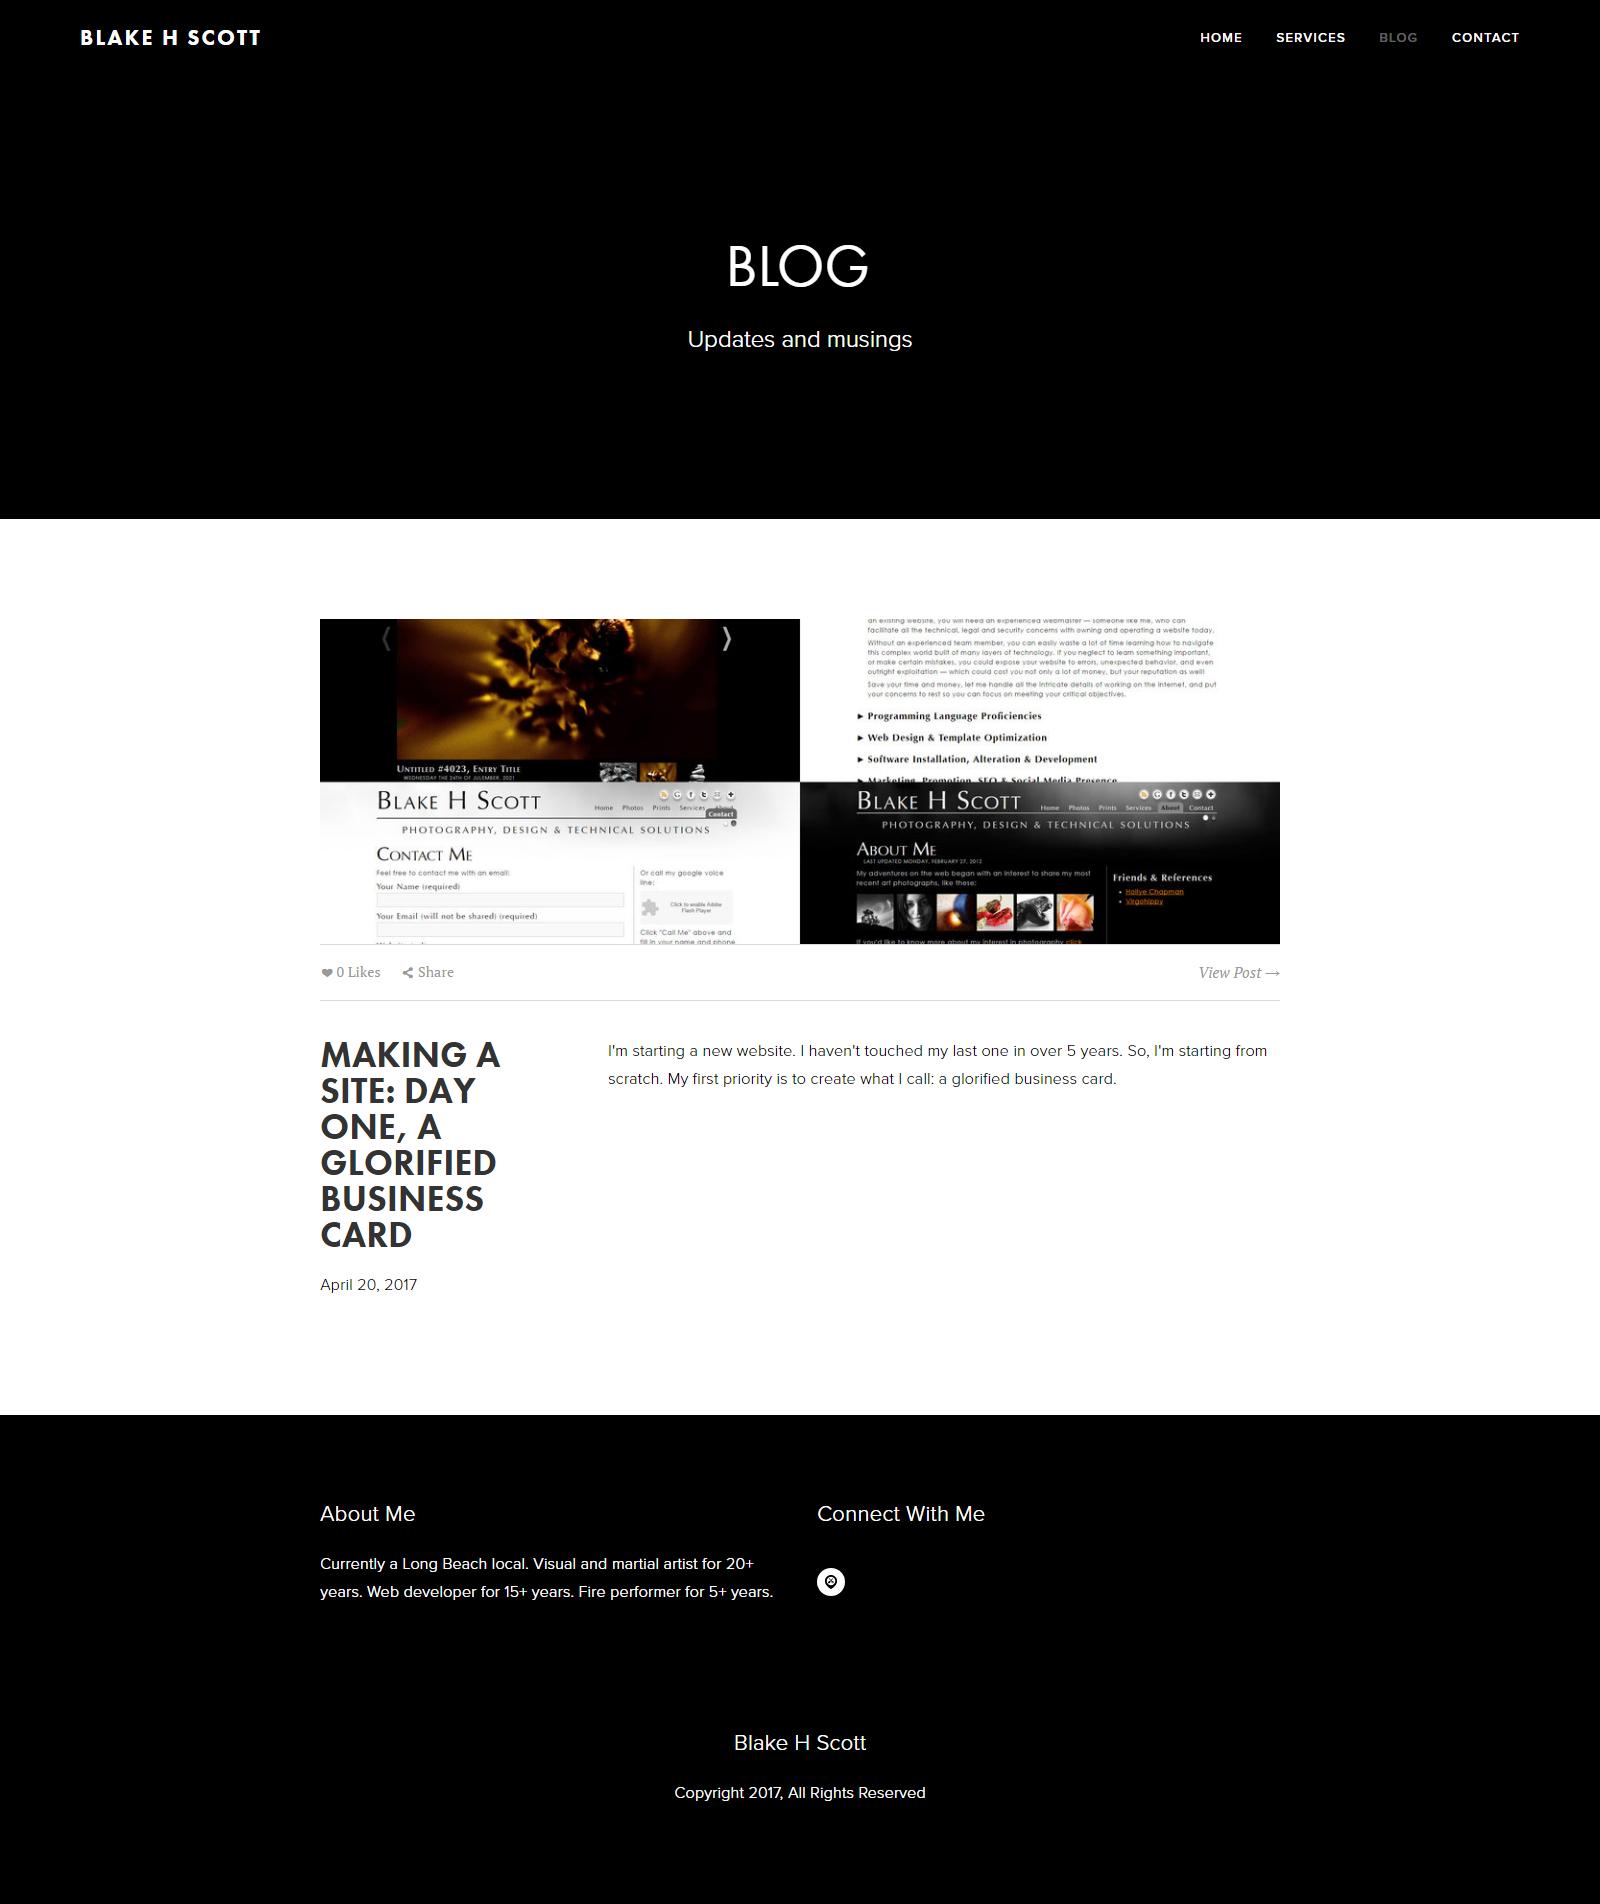 screencapture-blake-scott-633a-squarespace-blog-1493017202473.png